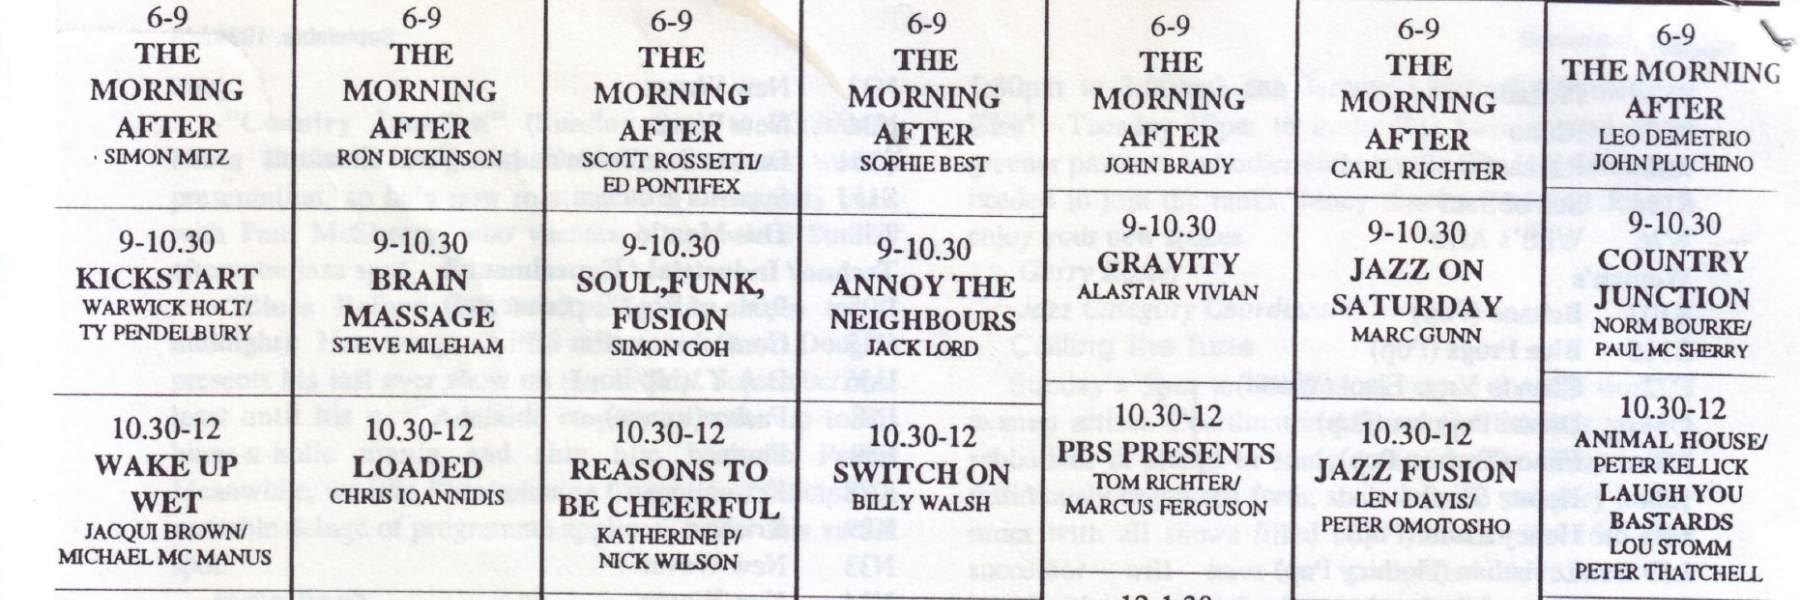 PBS grid 1994